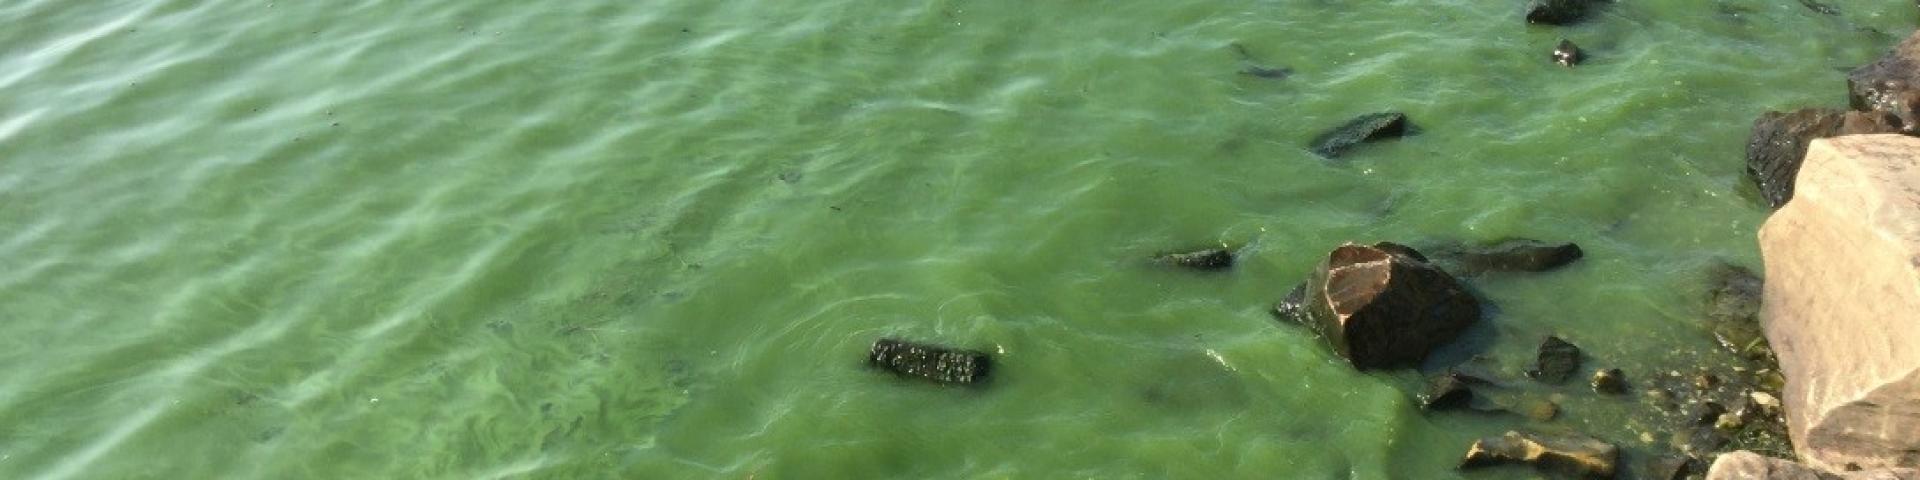 cyanobacteria bloom in Missisquoi Bay